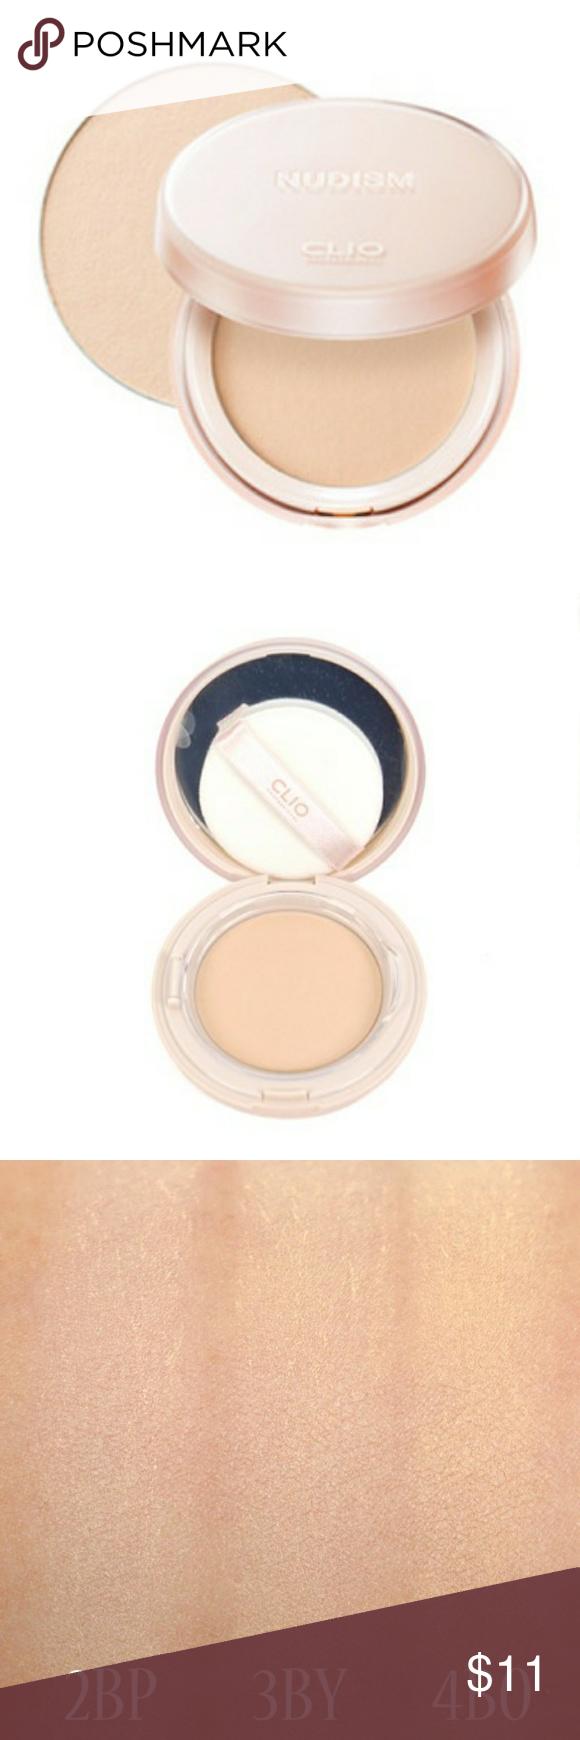 ℹ️🅾️ Clio Moist Fit Powder 4BO Ginger color Boutique